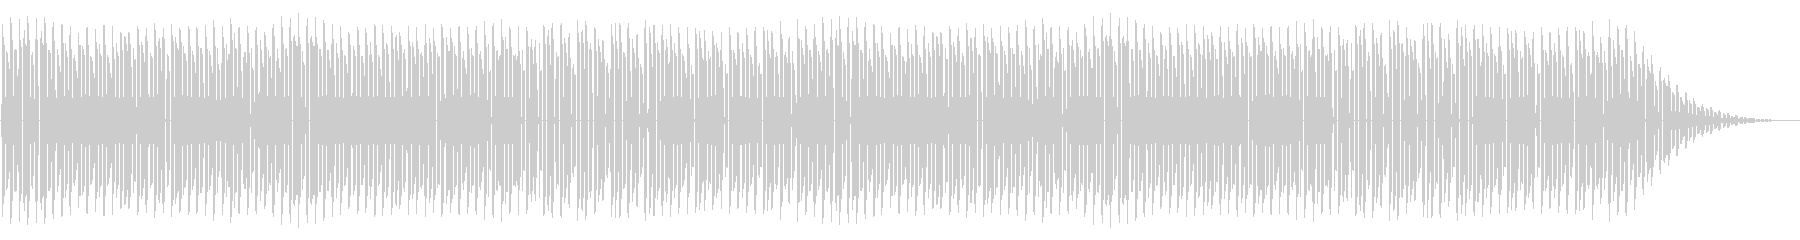 NES 和風 A04-1(ステージ3) の未再生の波形